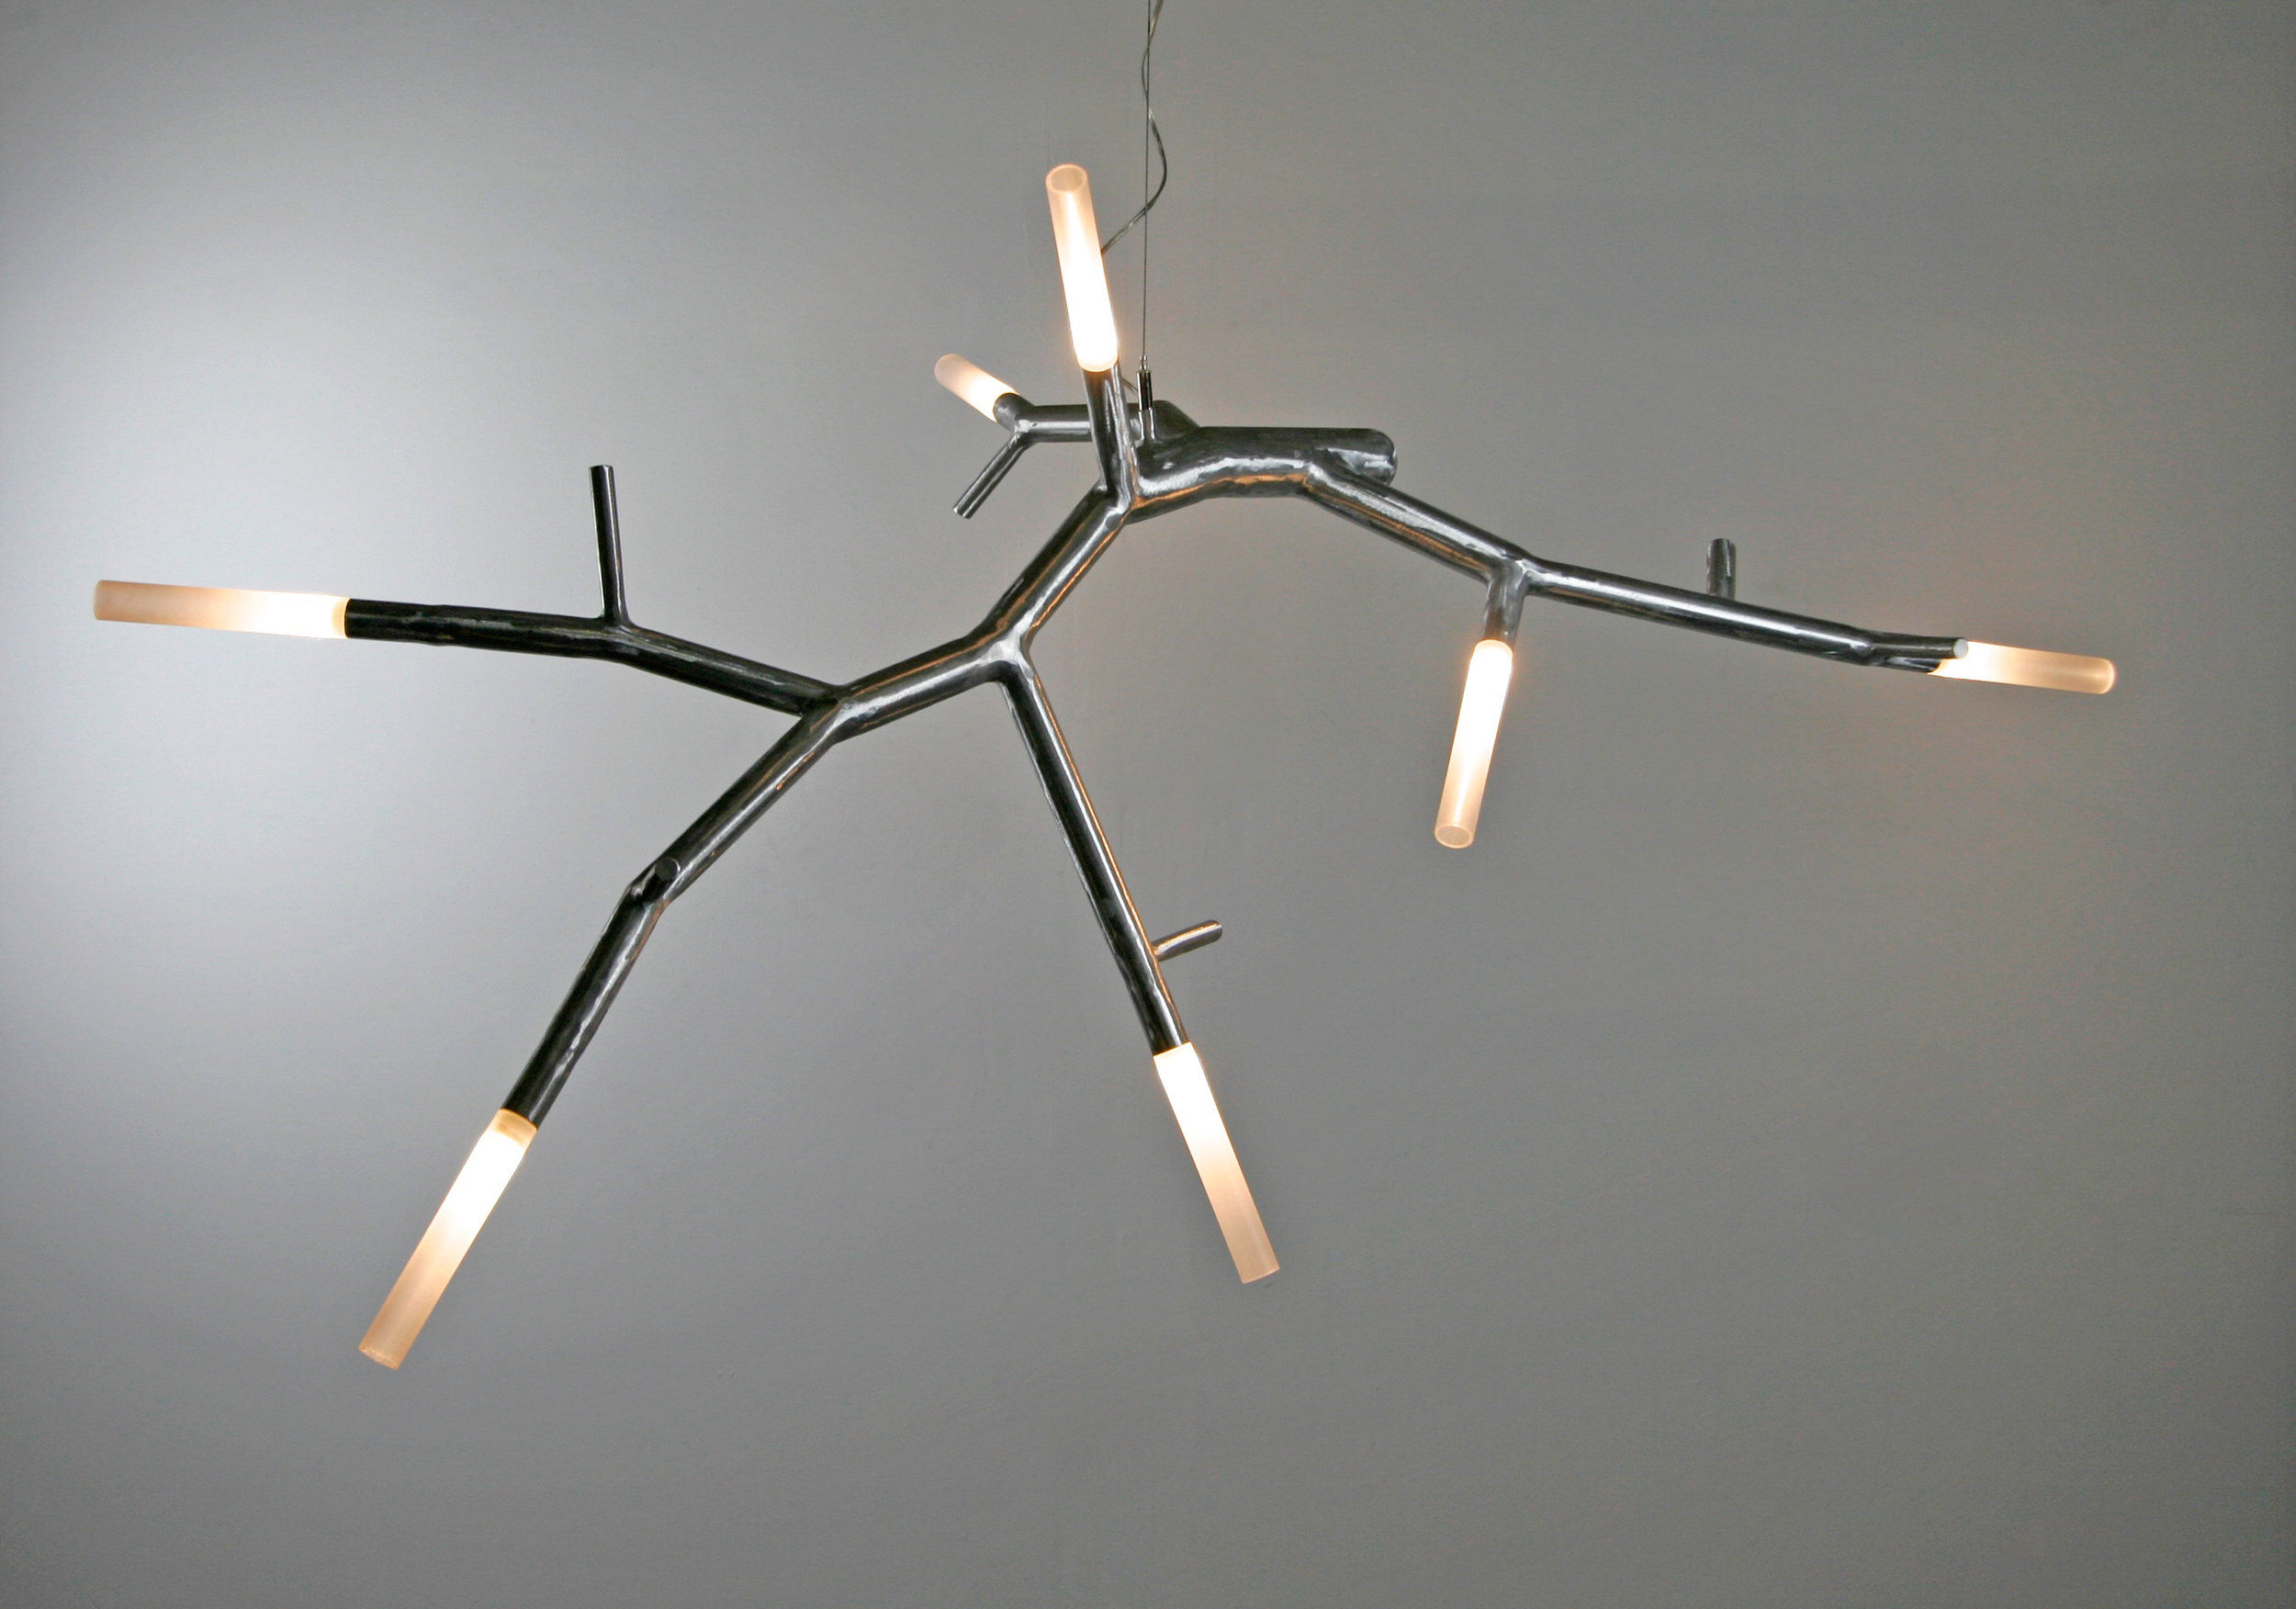 newGROWTH2 LED floating chandelier